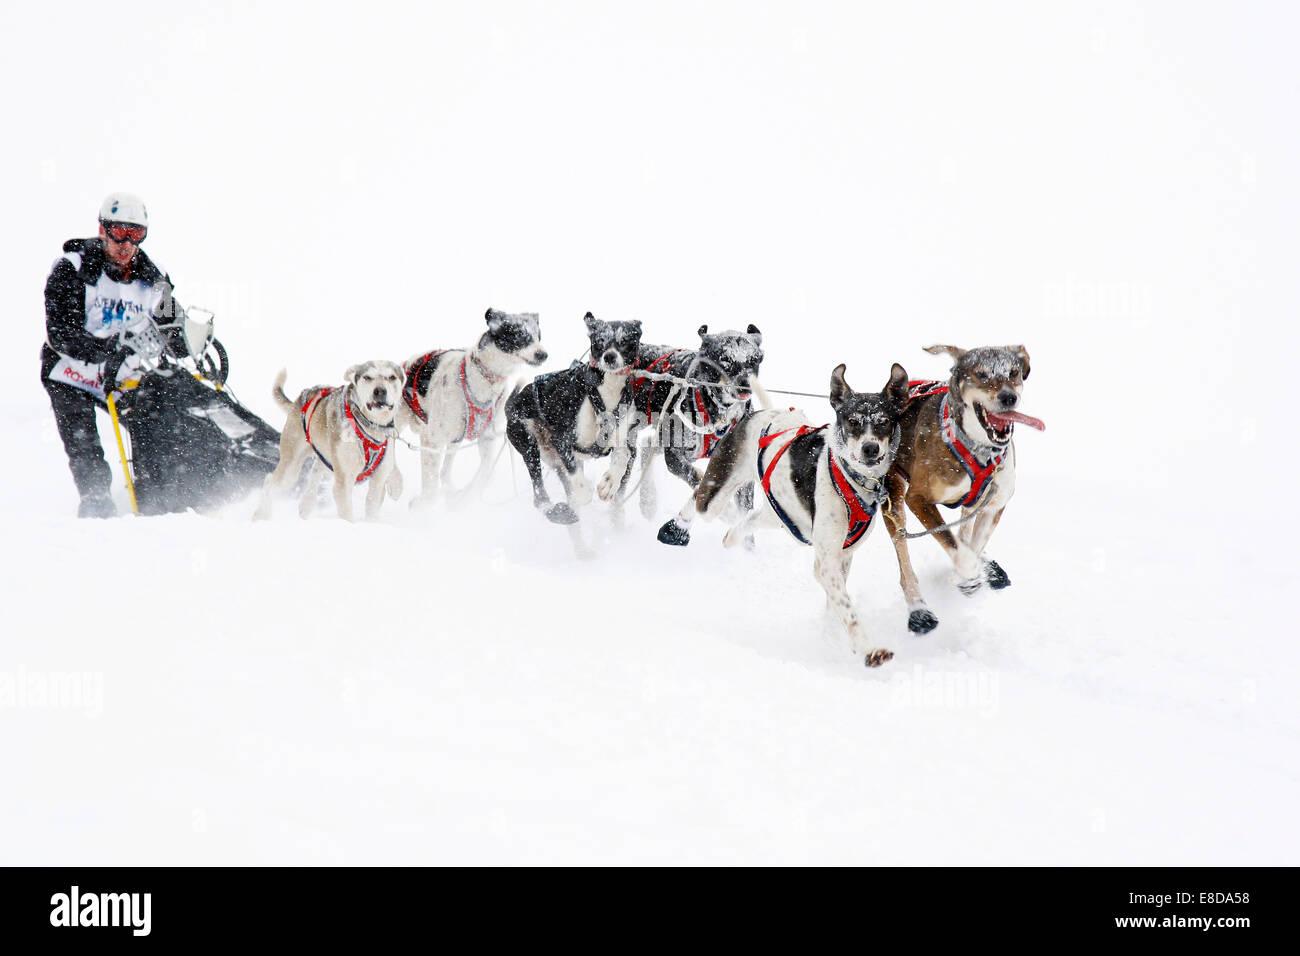 Alpine Trail Sled Dog Race 2013, Eurohounds, Prato Piazza alpine meadow, Fanes-Sennes-Prags Nature Park, Prags, Stock Photo